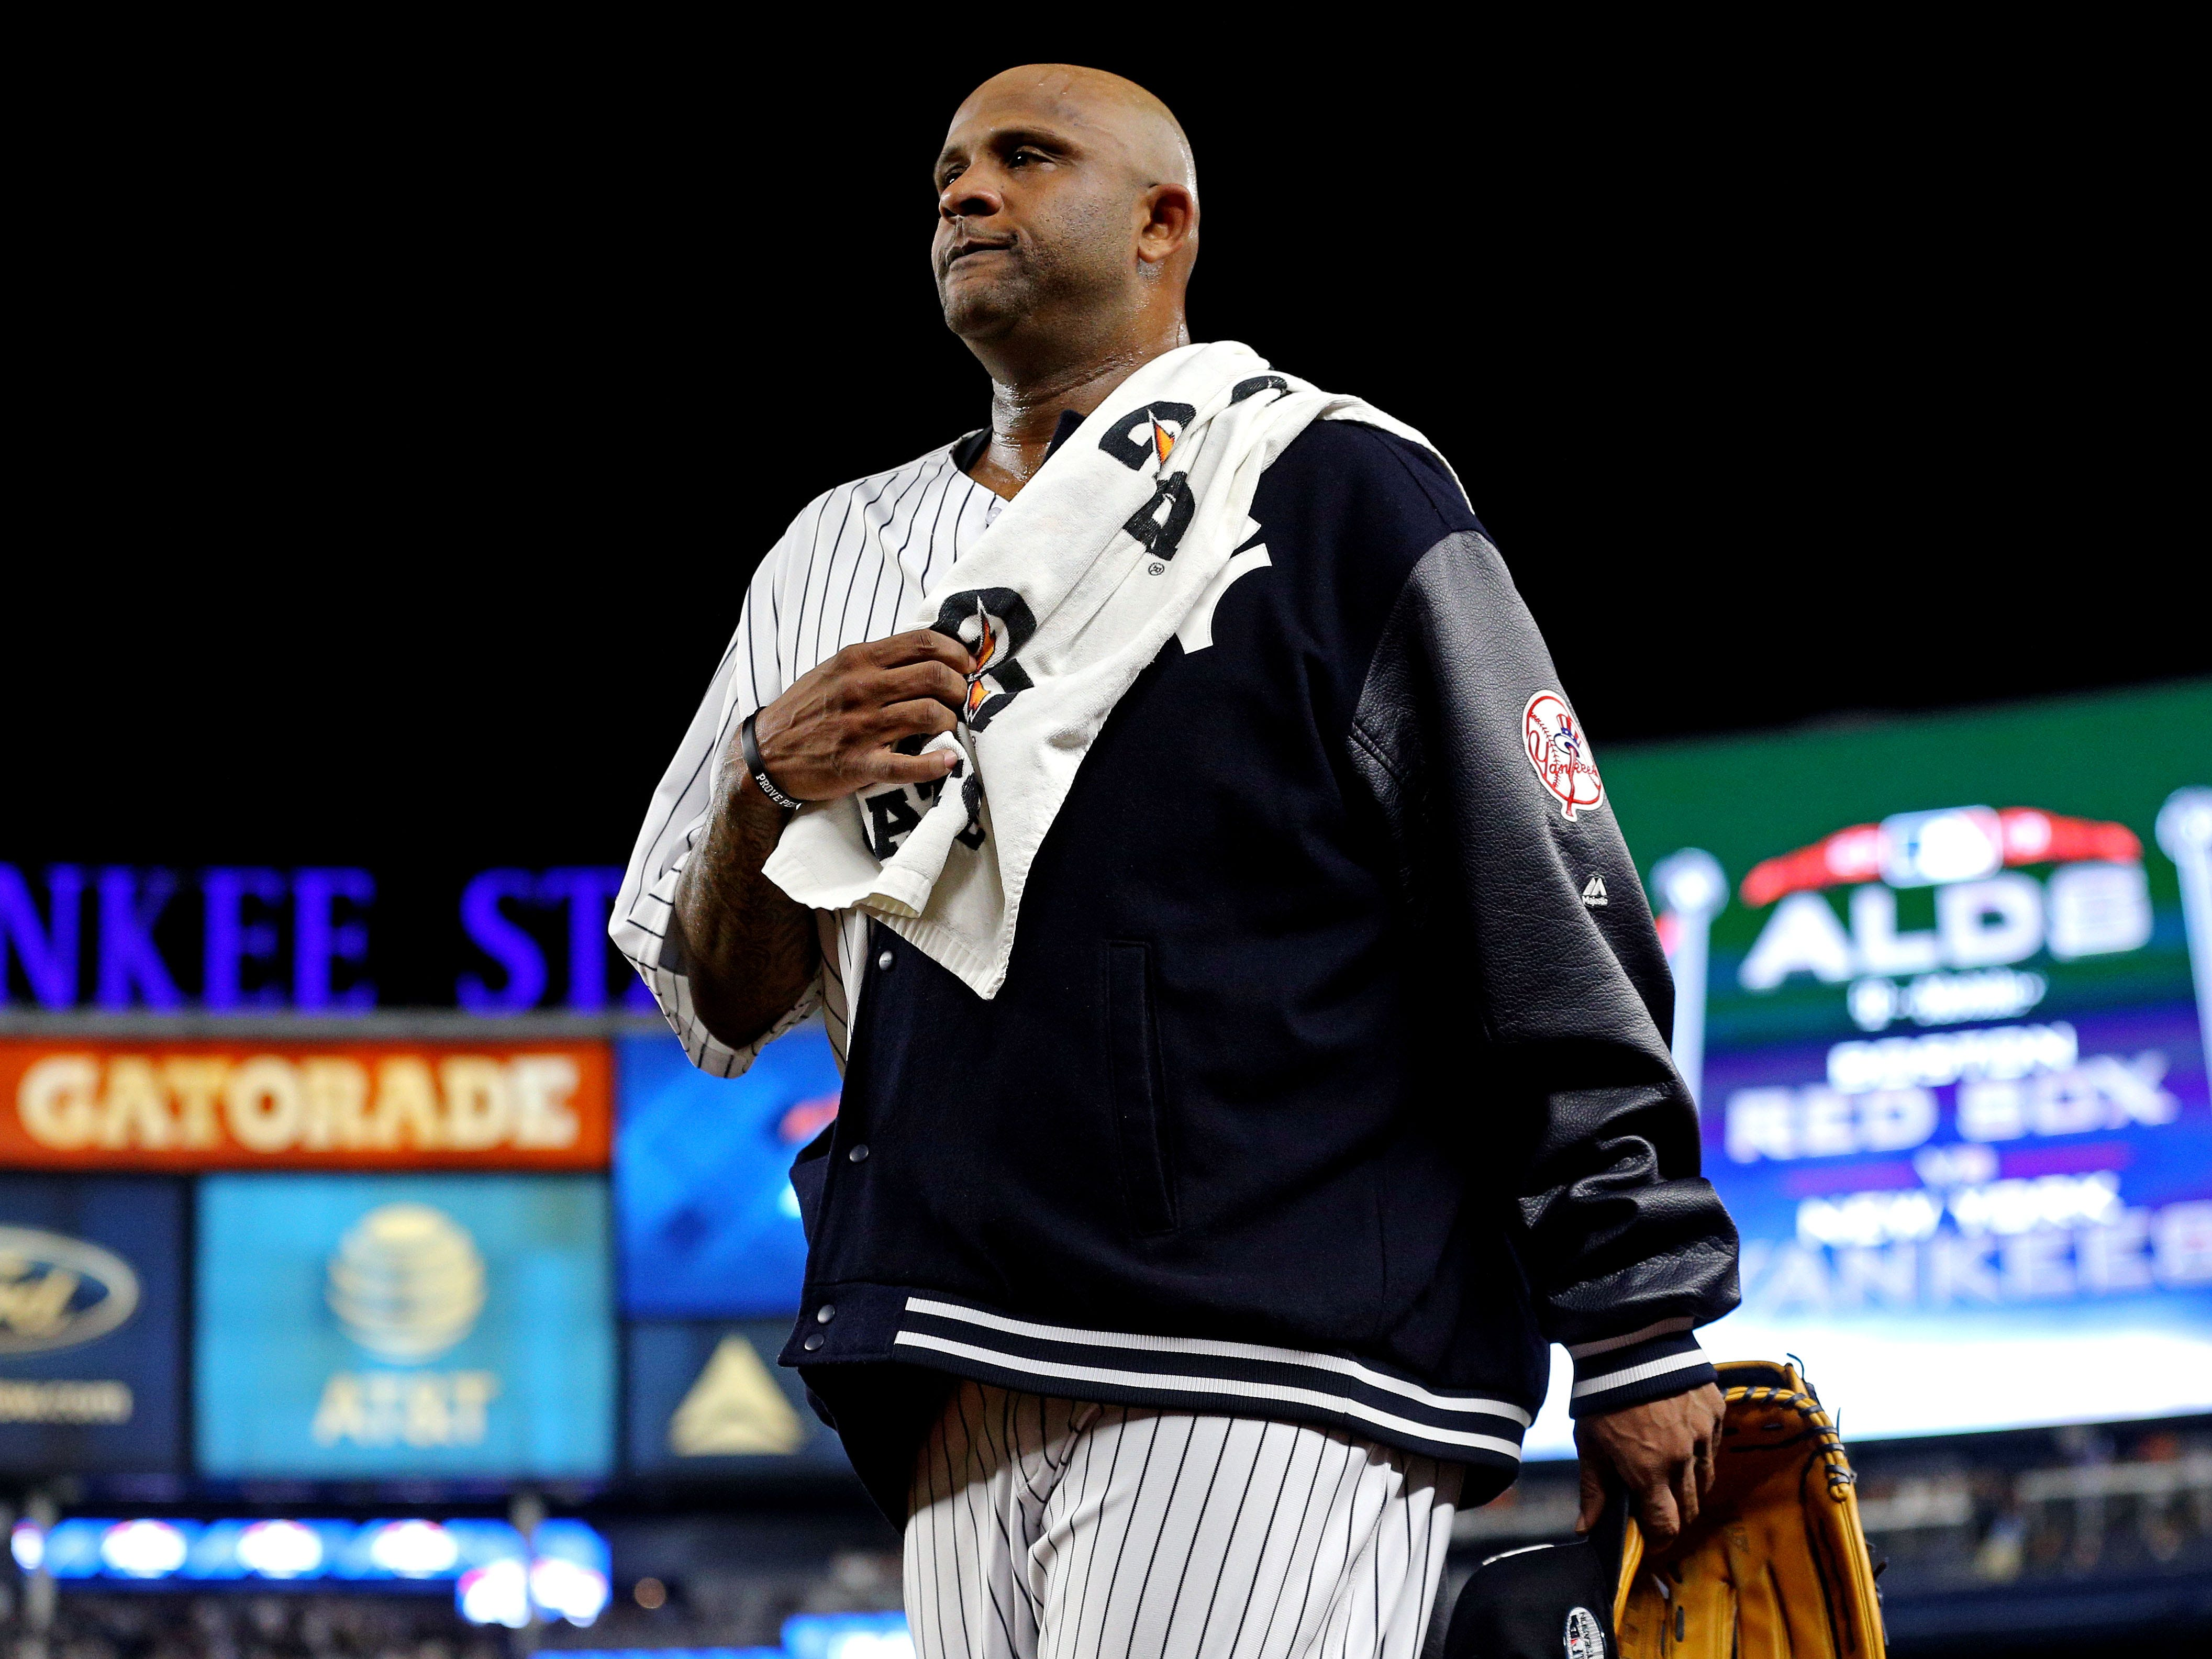 ALDS Game 4: Yankees starting pitcher CC Sabathia ready to take the mound.